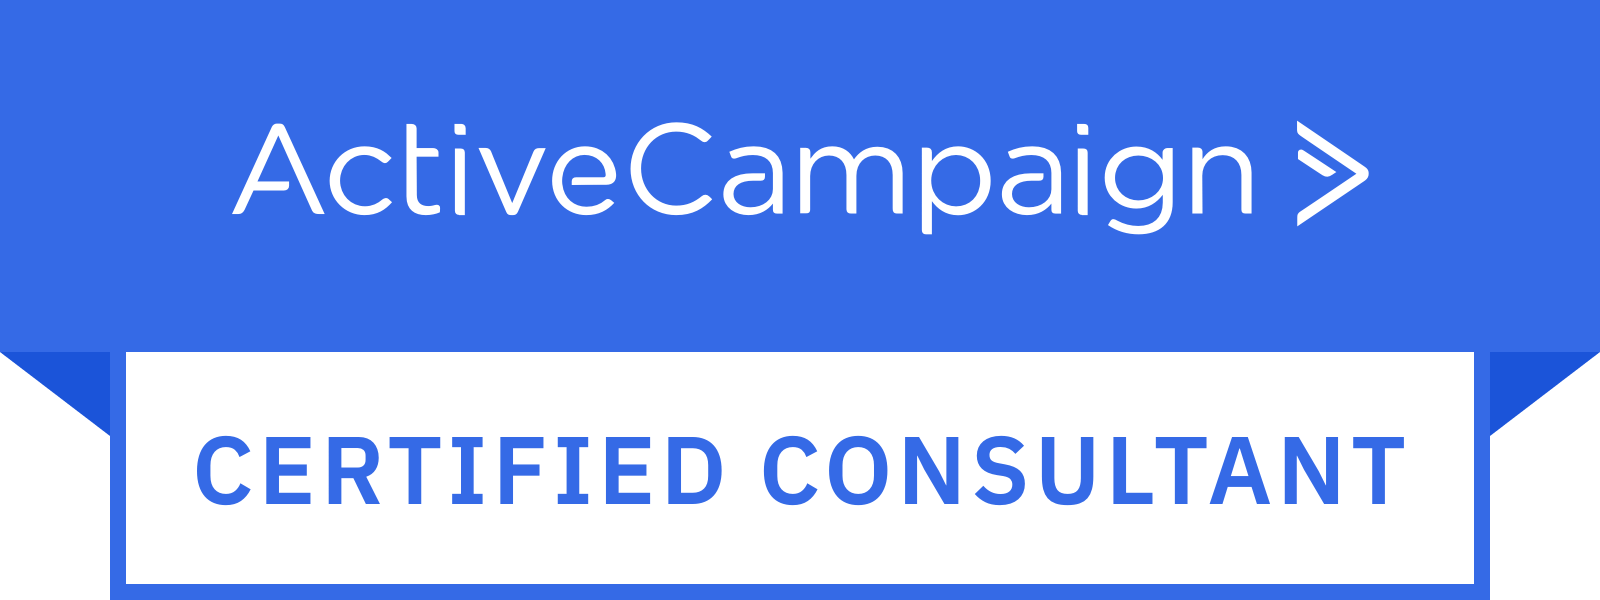 activecampaign certified consultant maria peagler Socialmediaonlineclasses.com